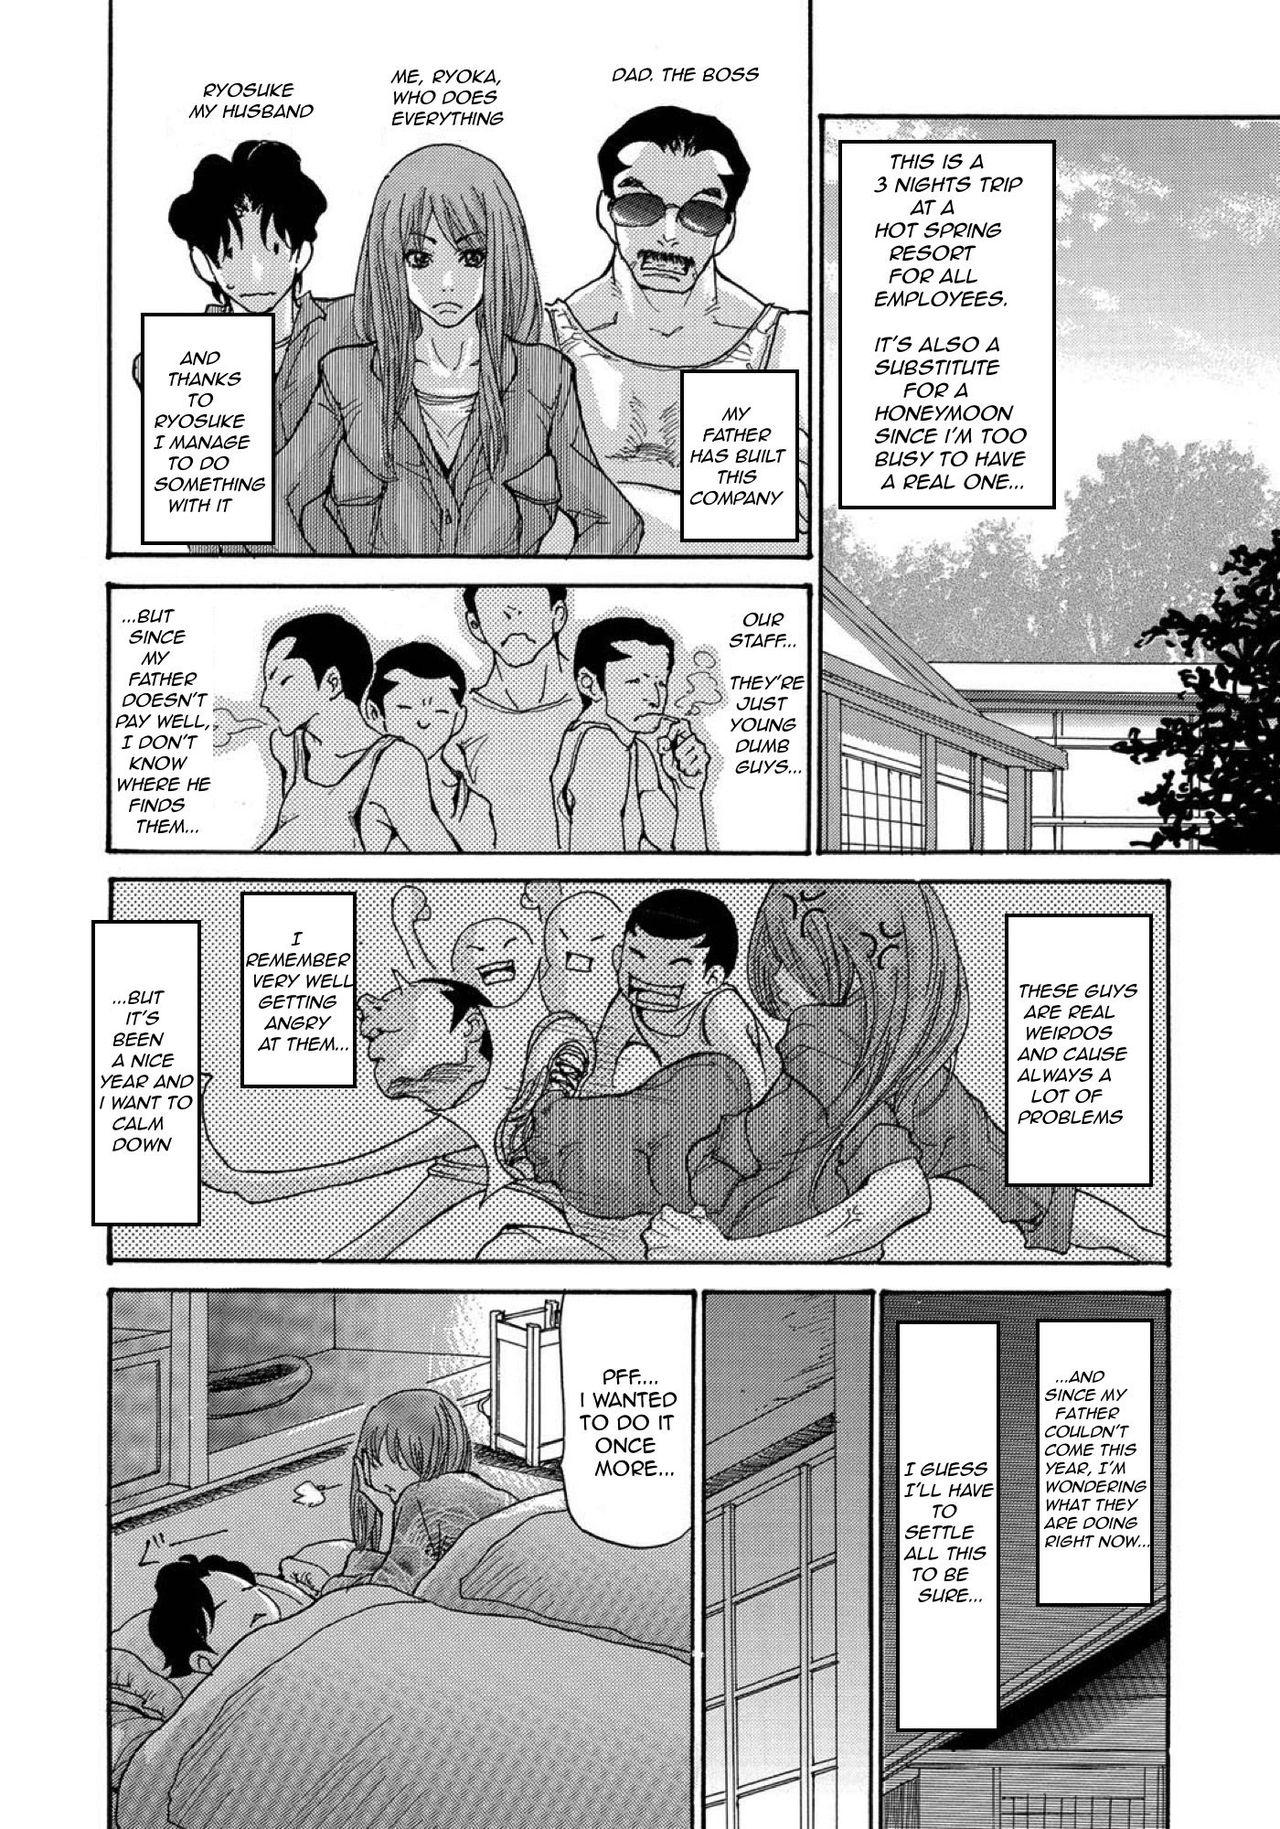 [Aoi Hitori] Yankee Zuma Kanraku!-Extended-Chapter 1-ONGOING[decensored][English][R-IC]ONGOING 7